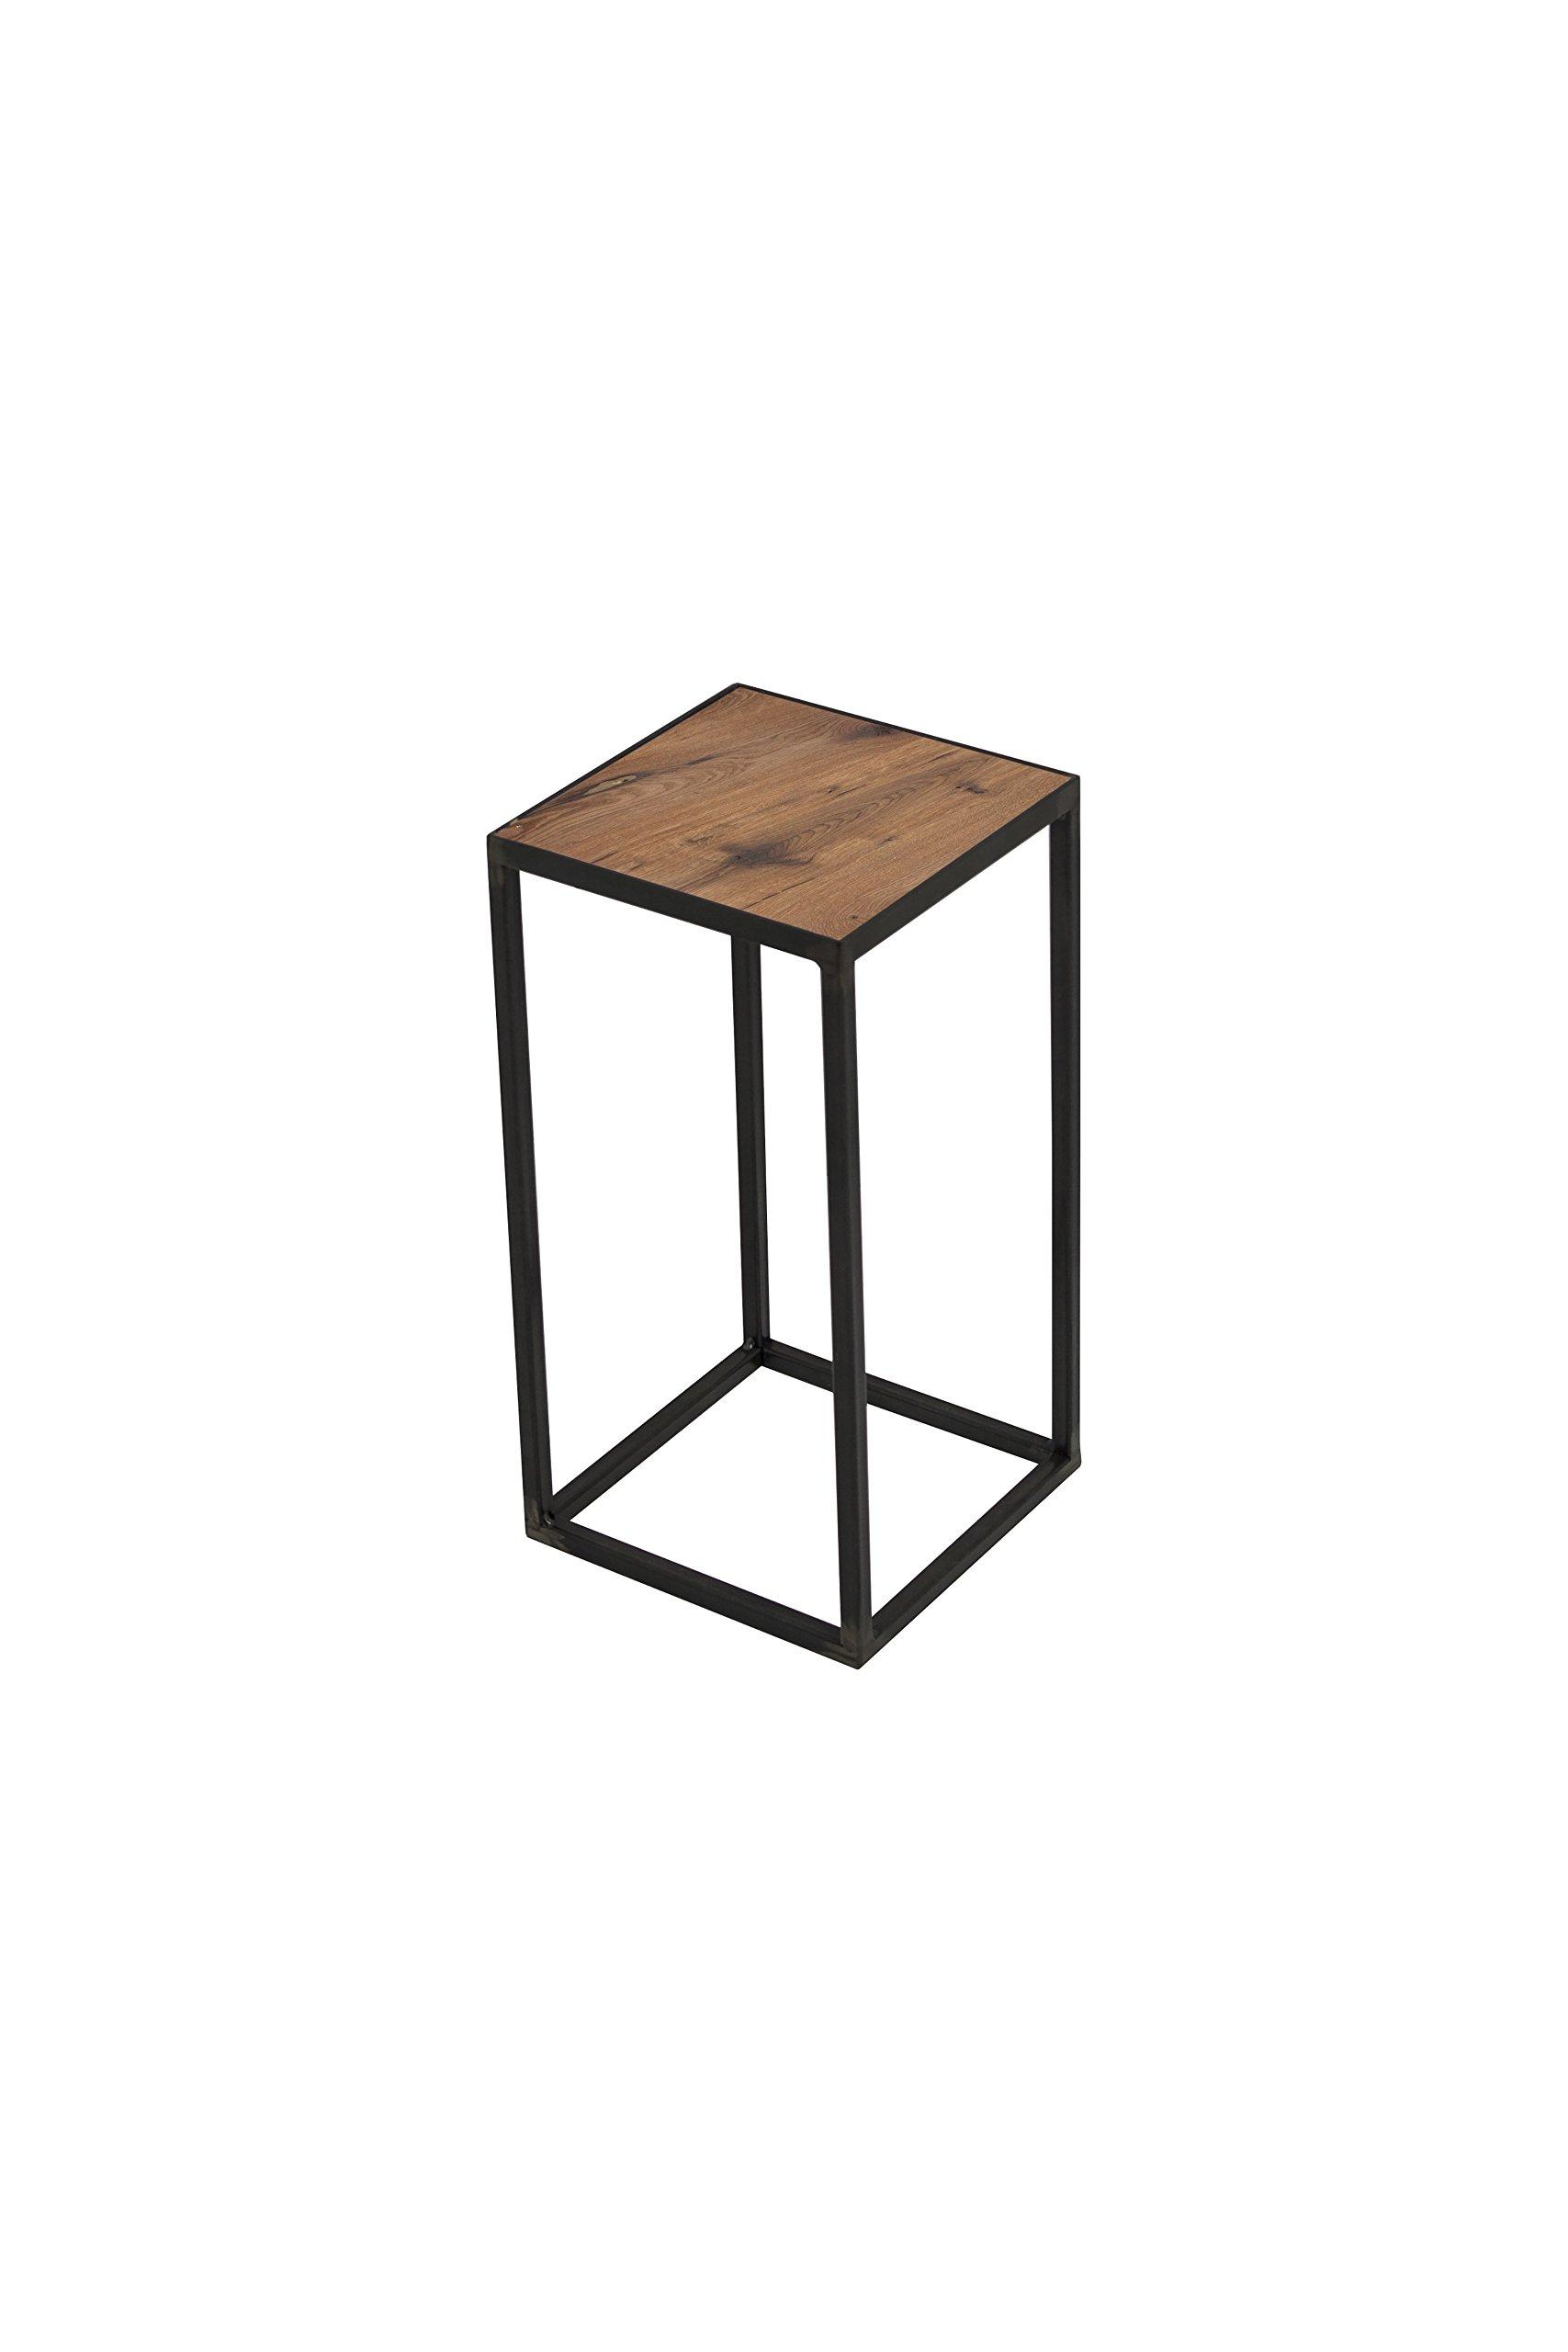 Spinder Design John - Soporte 20 x 20 x 40 - Herrero eeisern/Roble ...